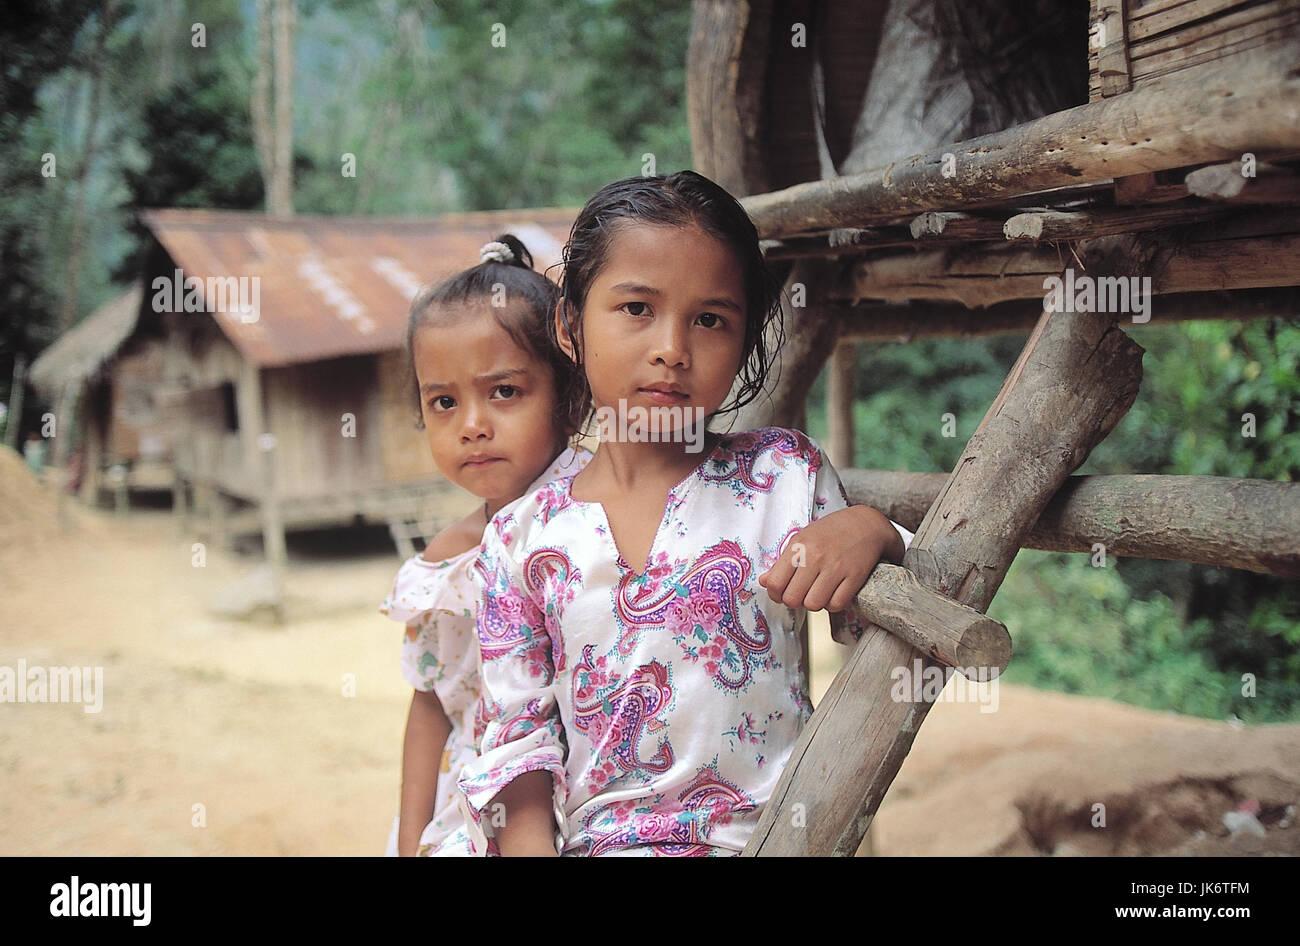 Malaysia, Cameron Highlands, Orang Asli, Pfahlbauten, Kinder  Asien, Bergland, Mädchen, zwei, einheimisch, - Stock Image